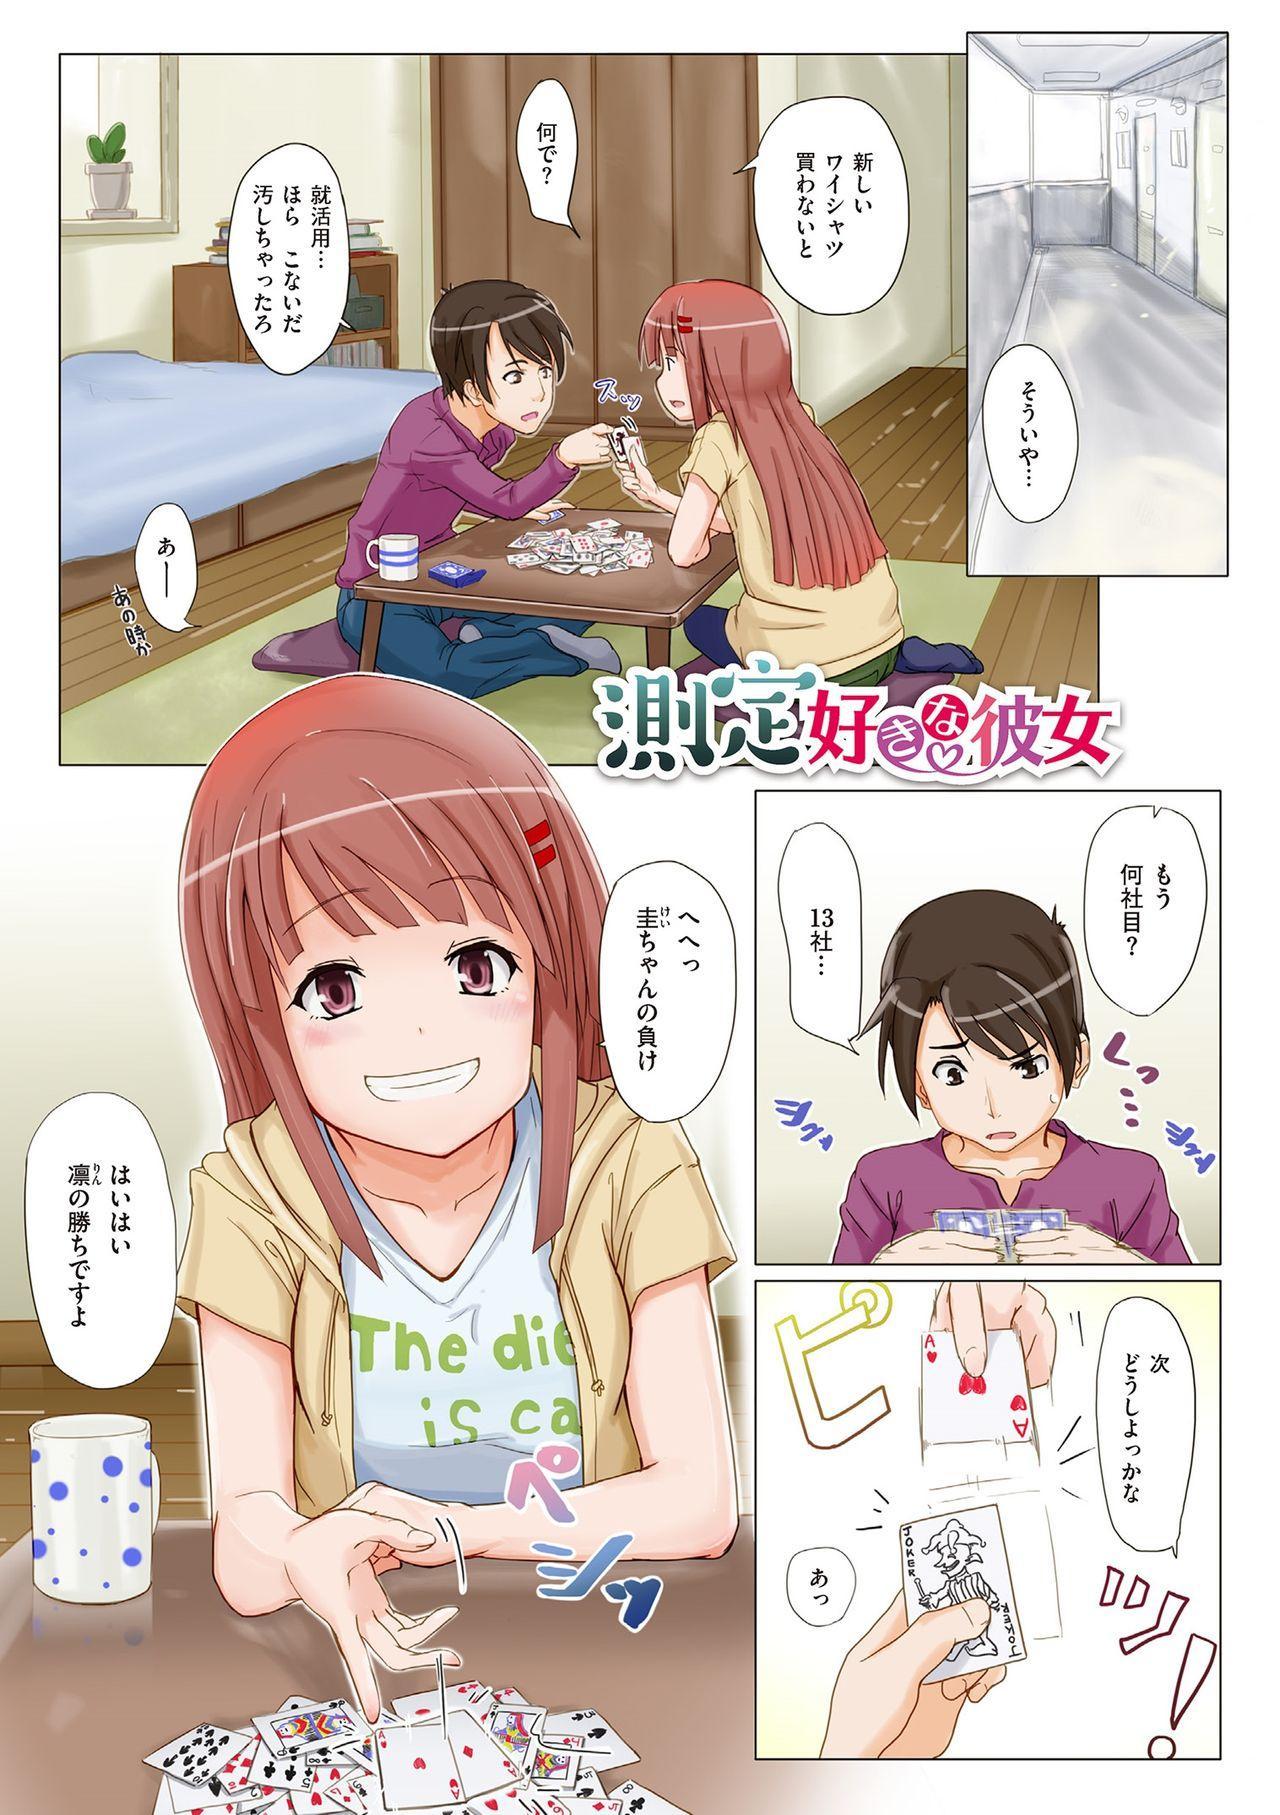 [Kosuke Haruhito] Are-zuki Kanojo - happy sexperience [Digital] 132